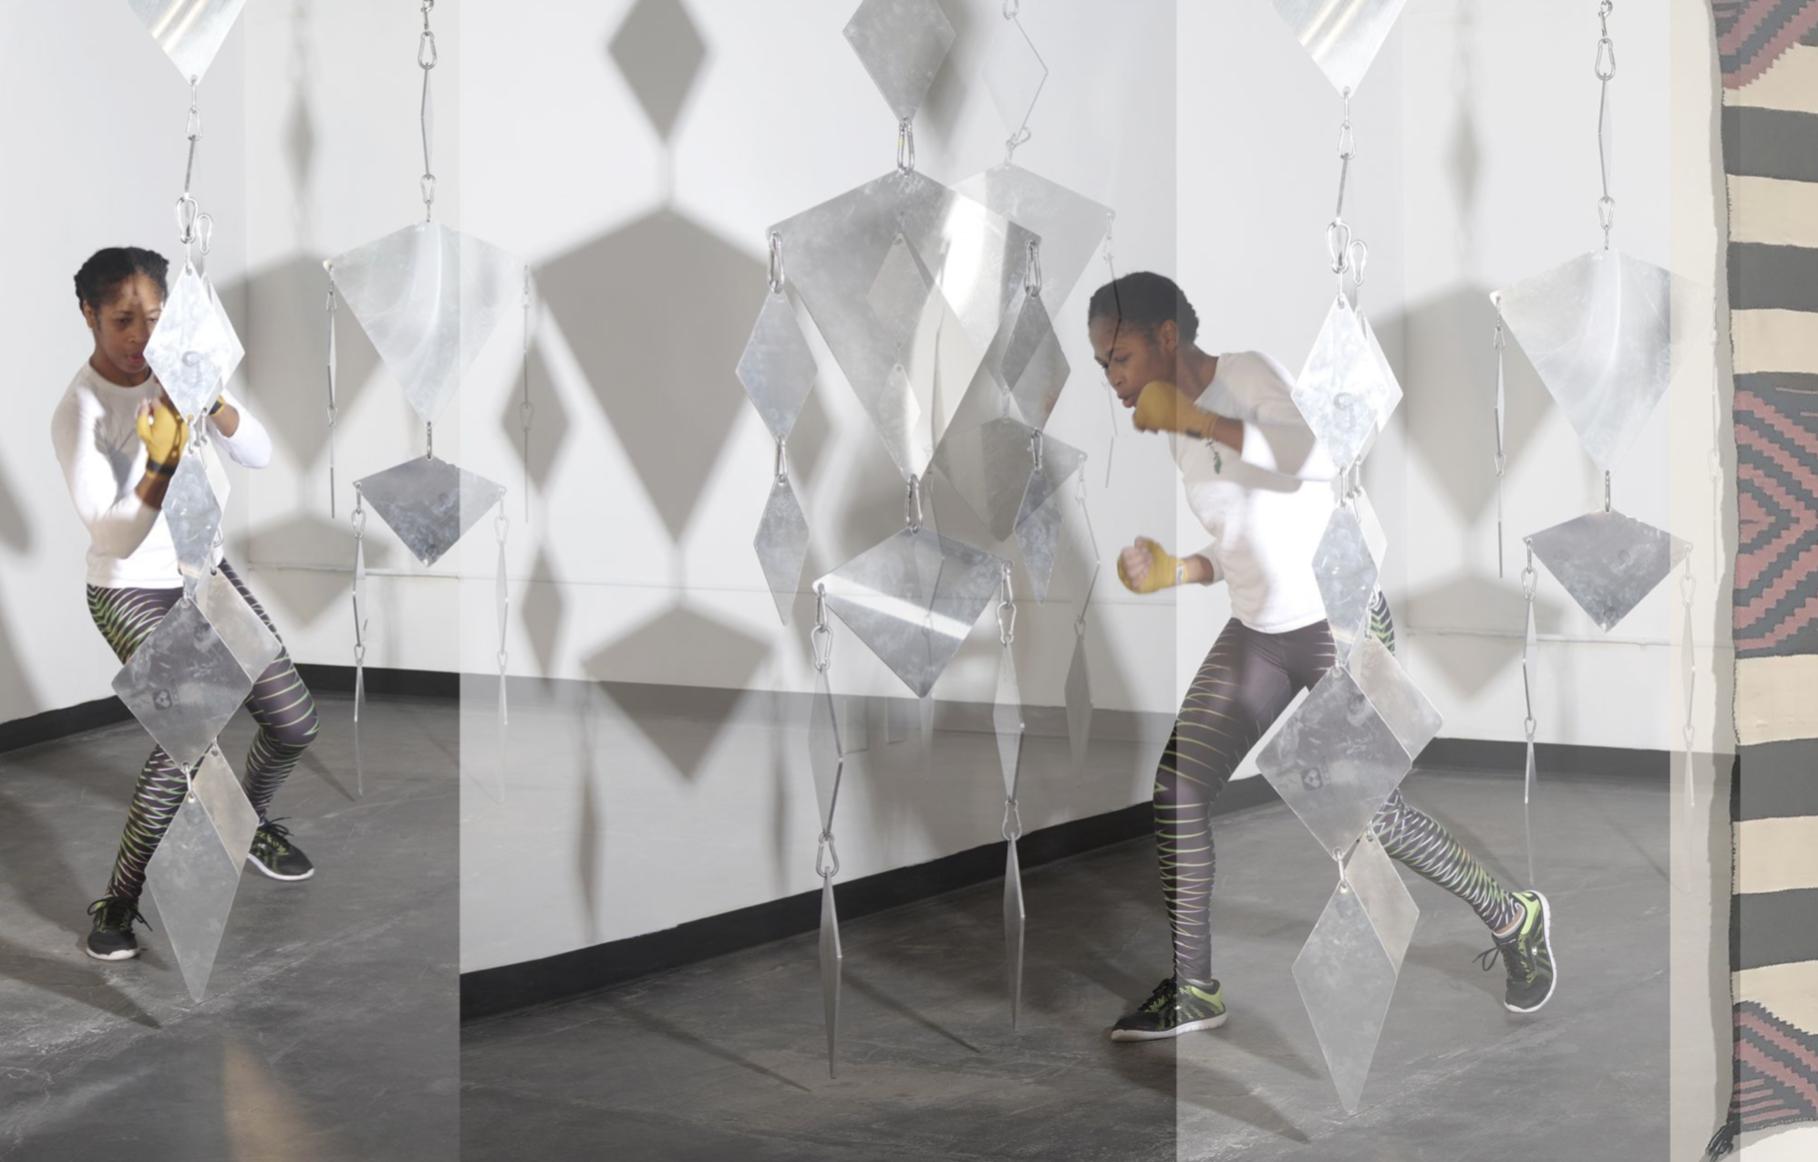 Dana Hoey, Petzel Gallery